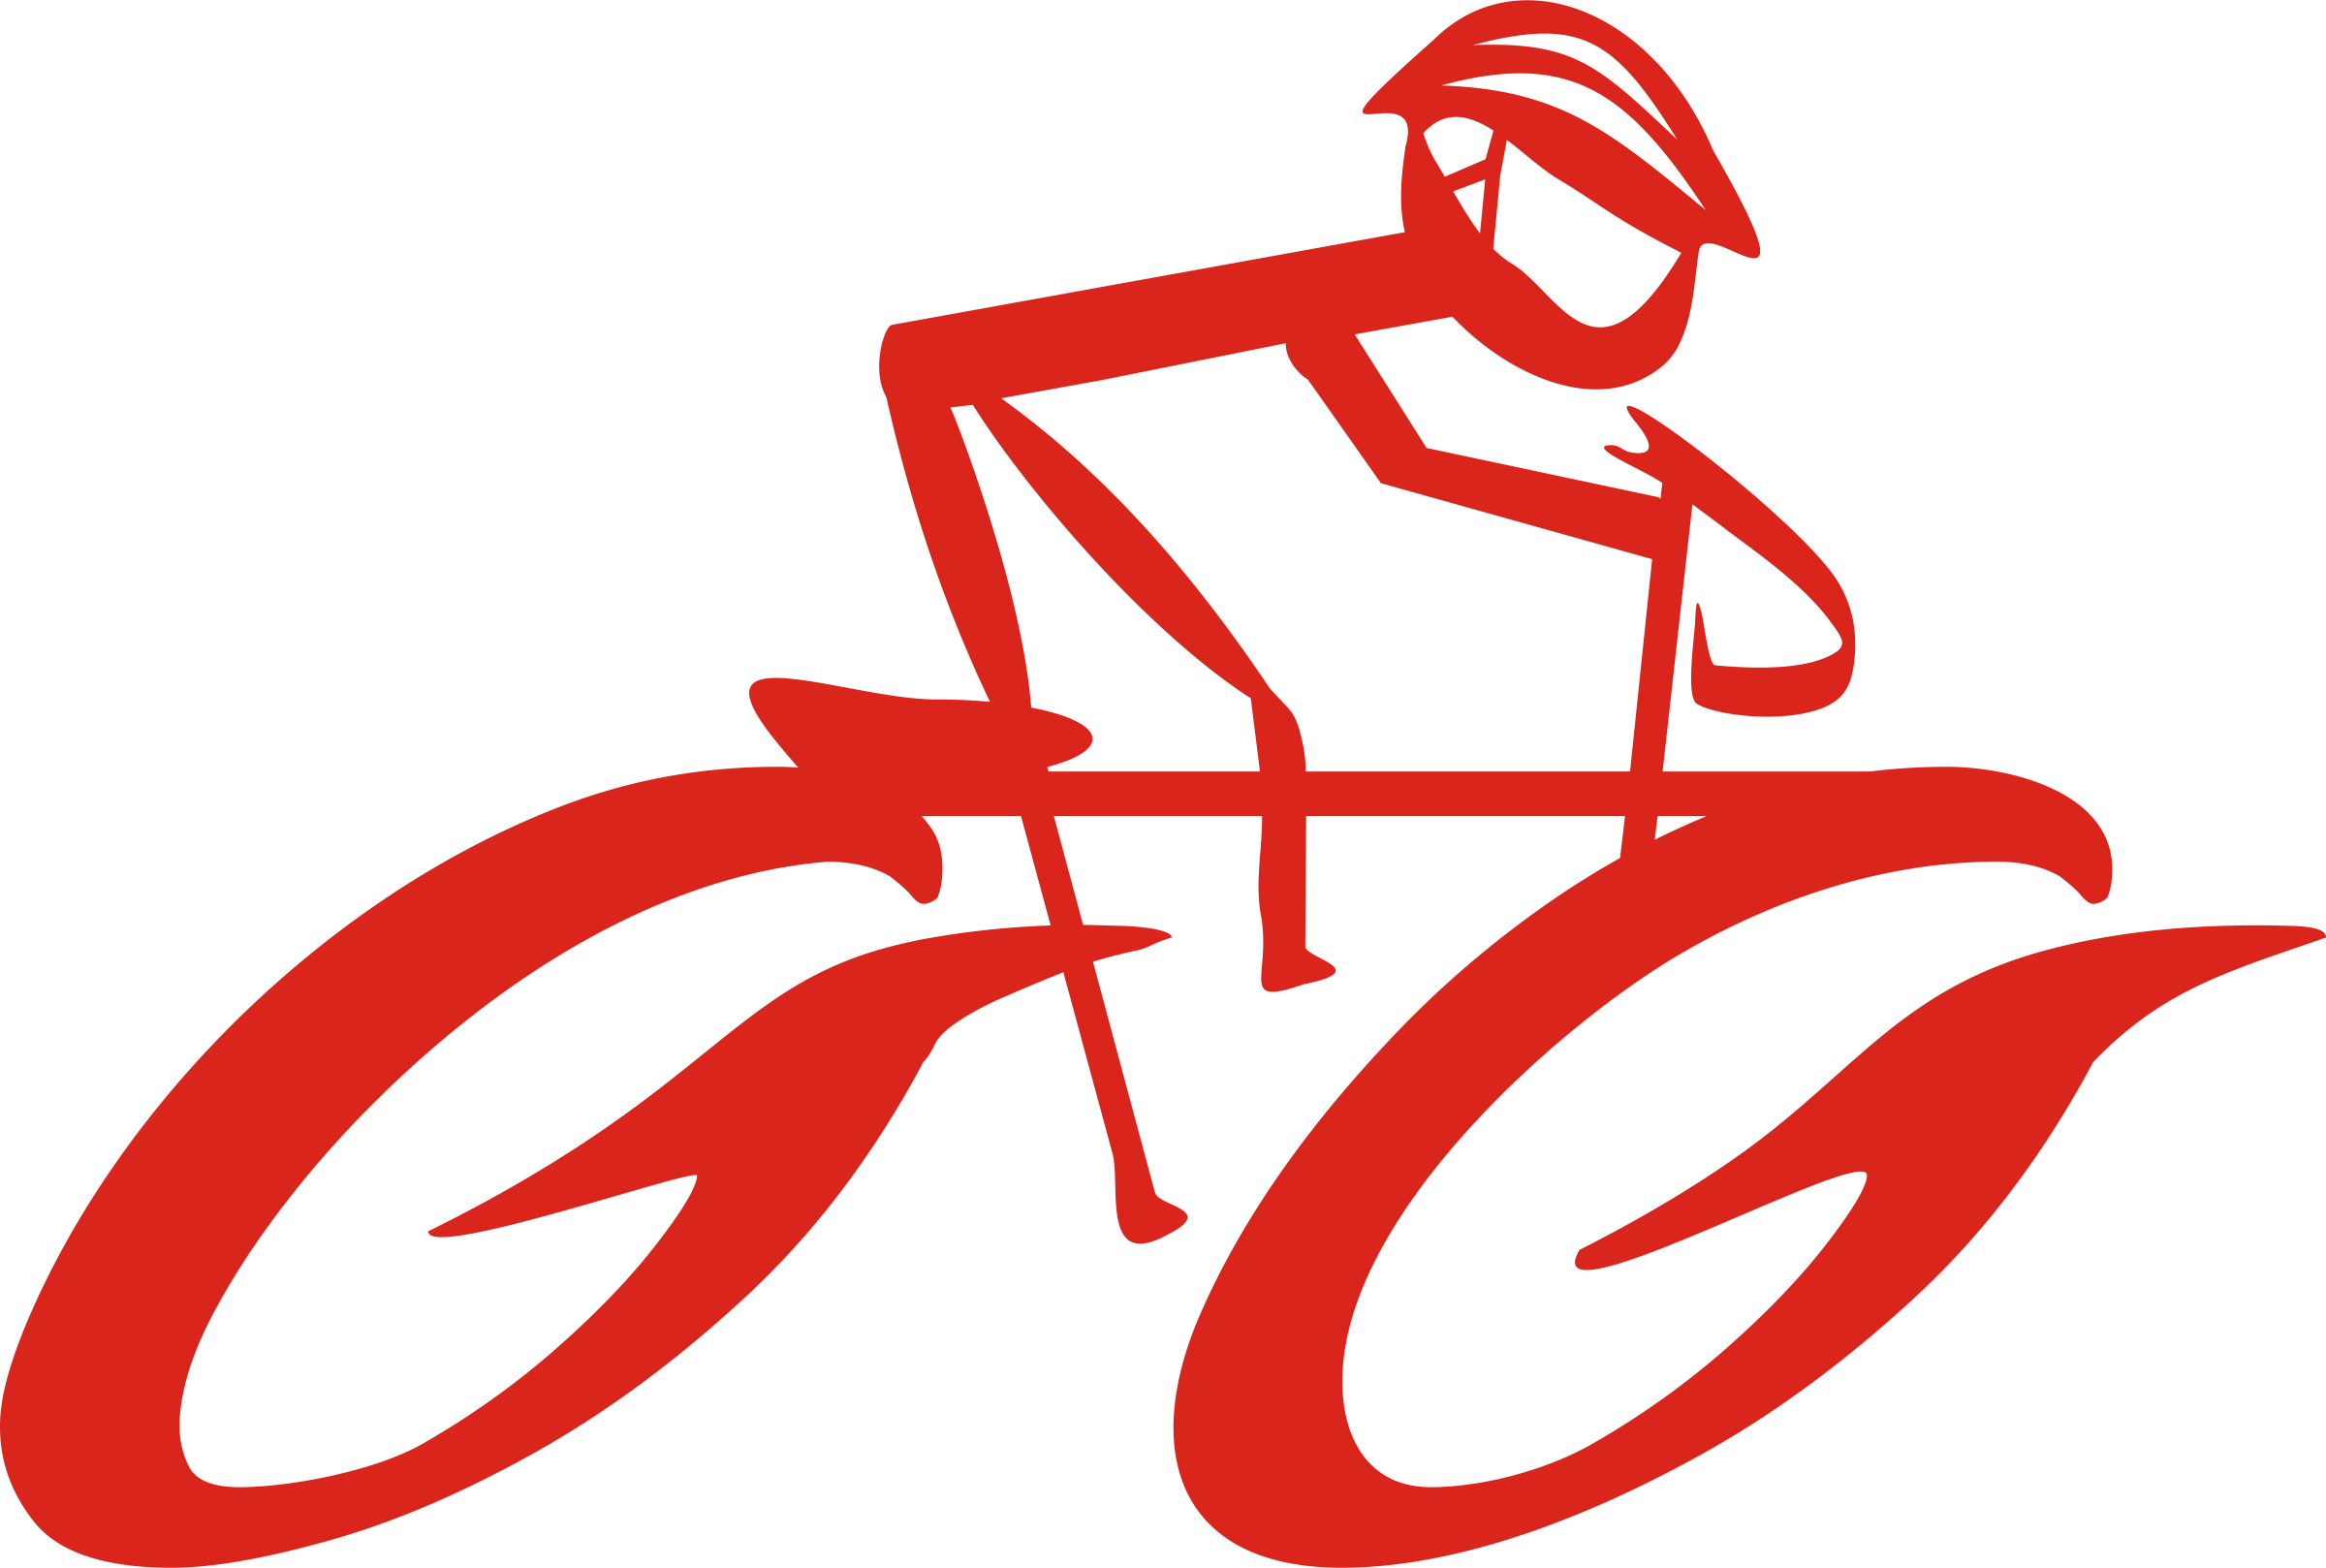 clipart mountain bike rider - photo #5